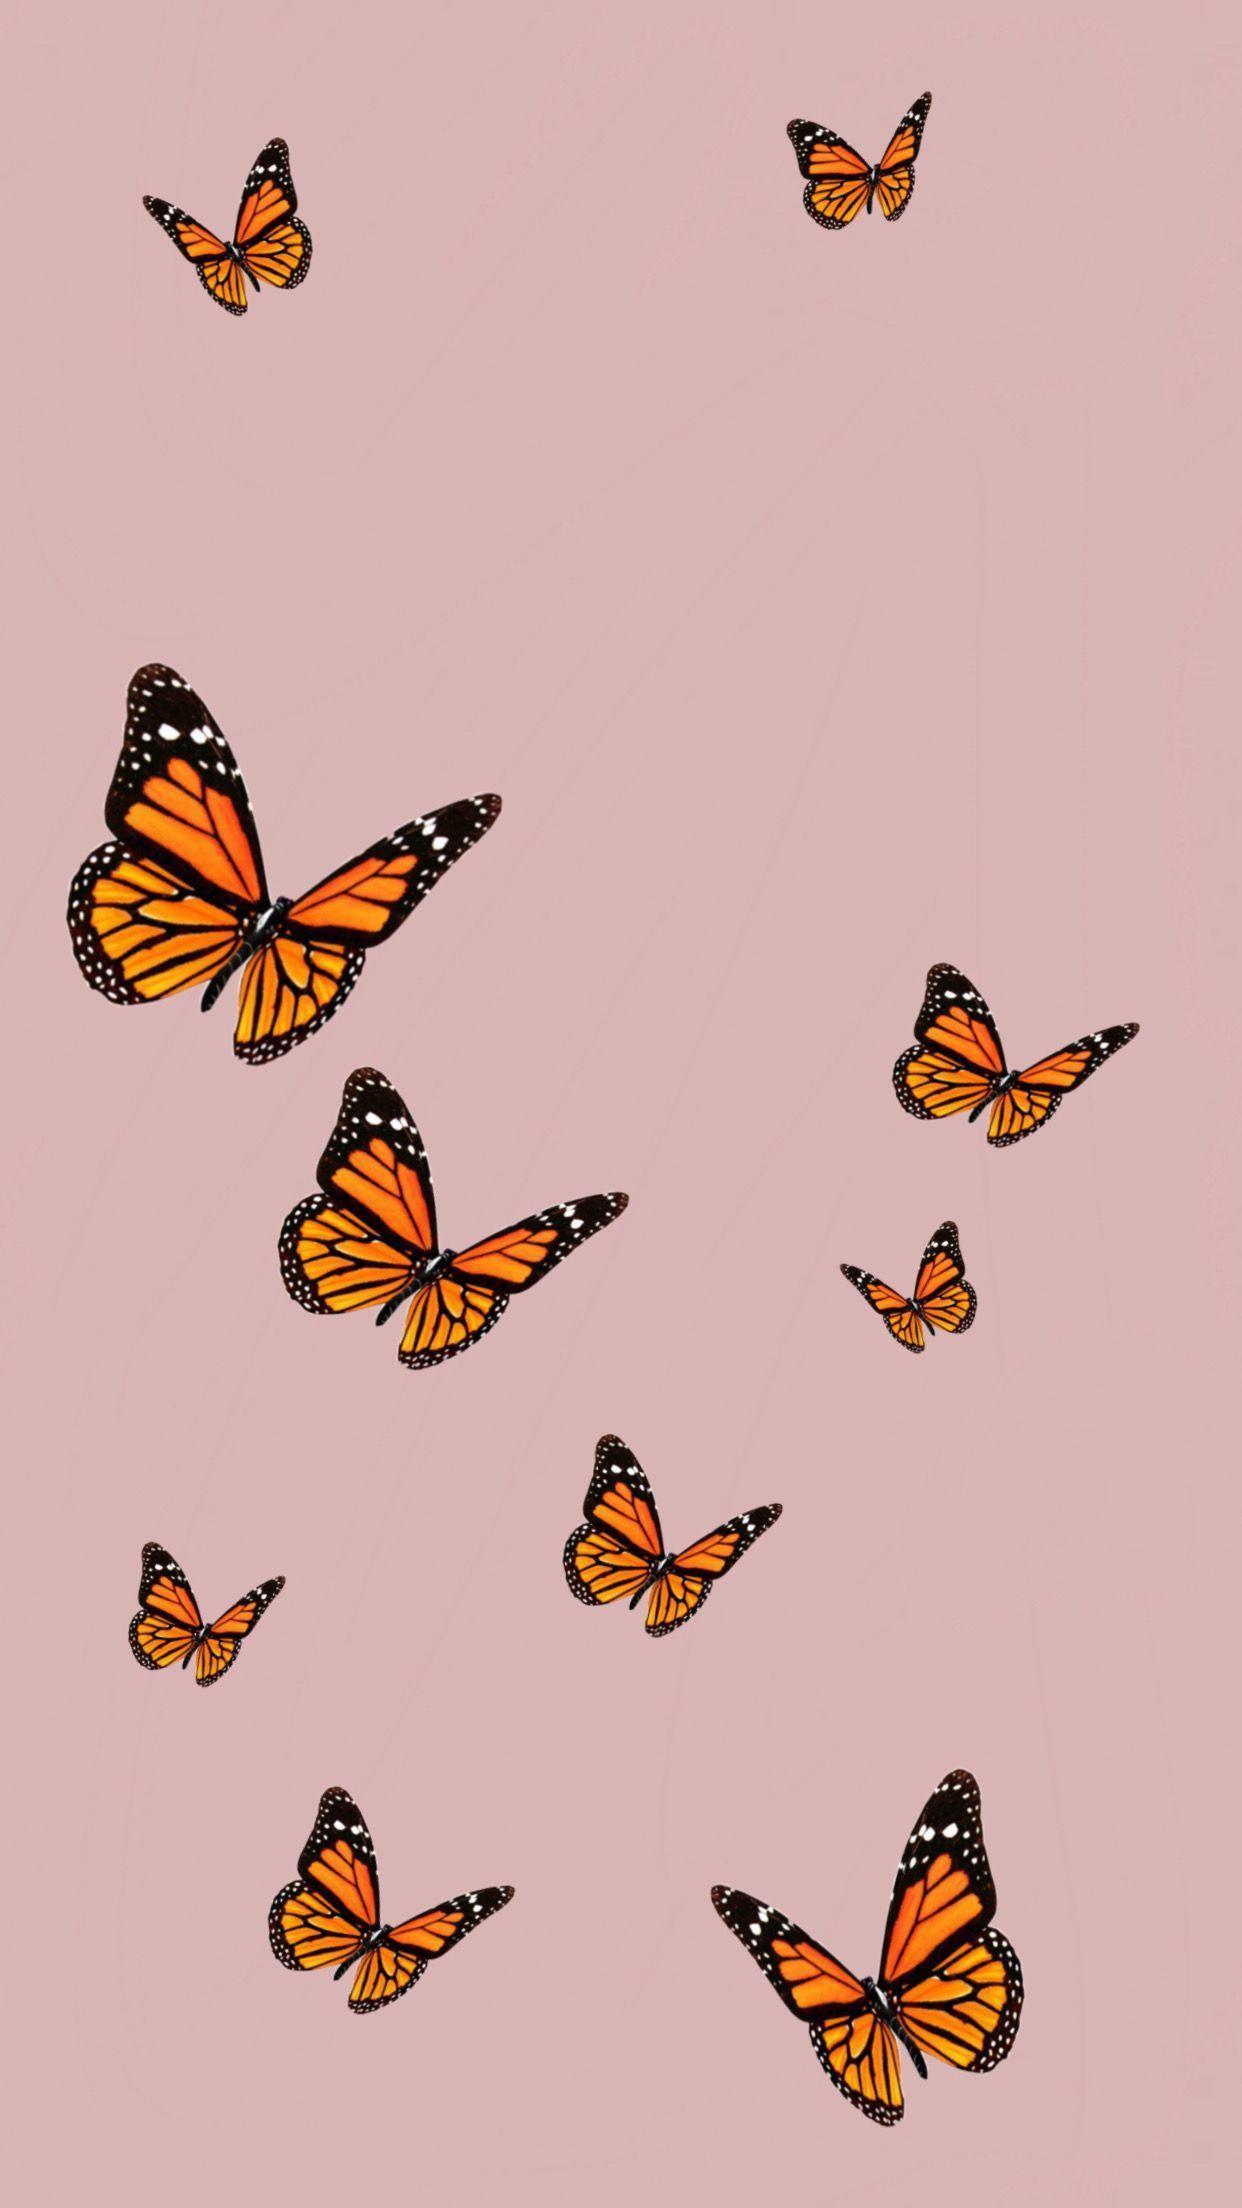 Phone Wall Paper Pastel Phonewallpaper Iphonewallpaper Butterfly Wallpaper Iphone Iphone Wallpaper Vsco Aesthetic Iphone Wallpaper